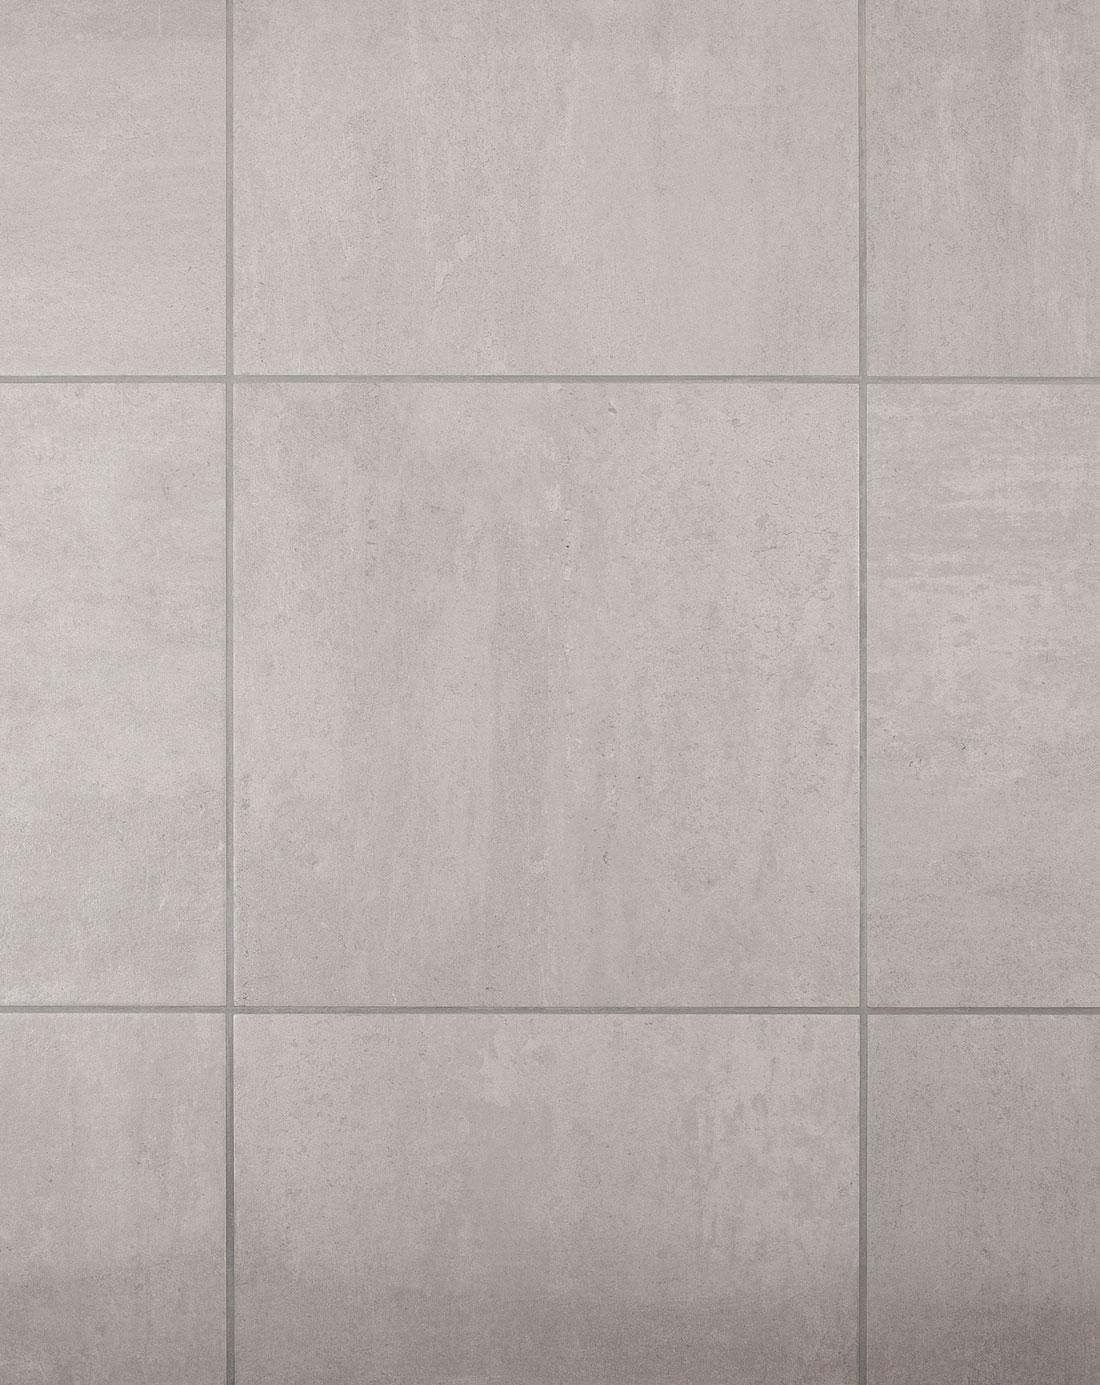 Grigio concept kitchen floor tiles 1895m2 free samples grigio concept kitchen floor tiles kitchentilesdirect dailygadgetfo Images